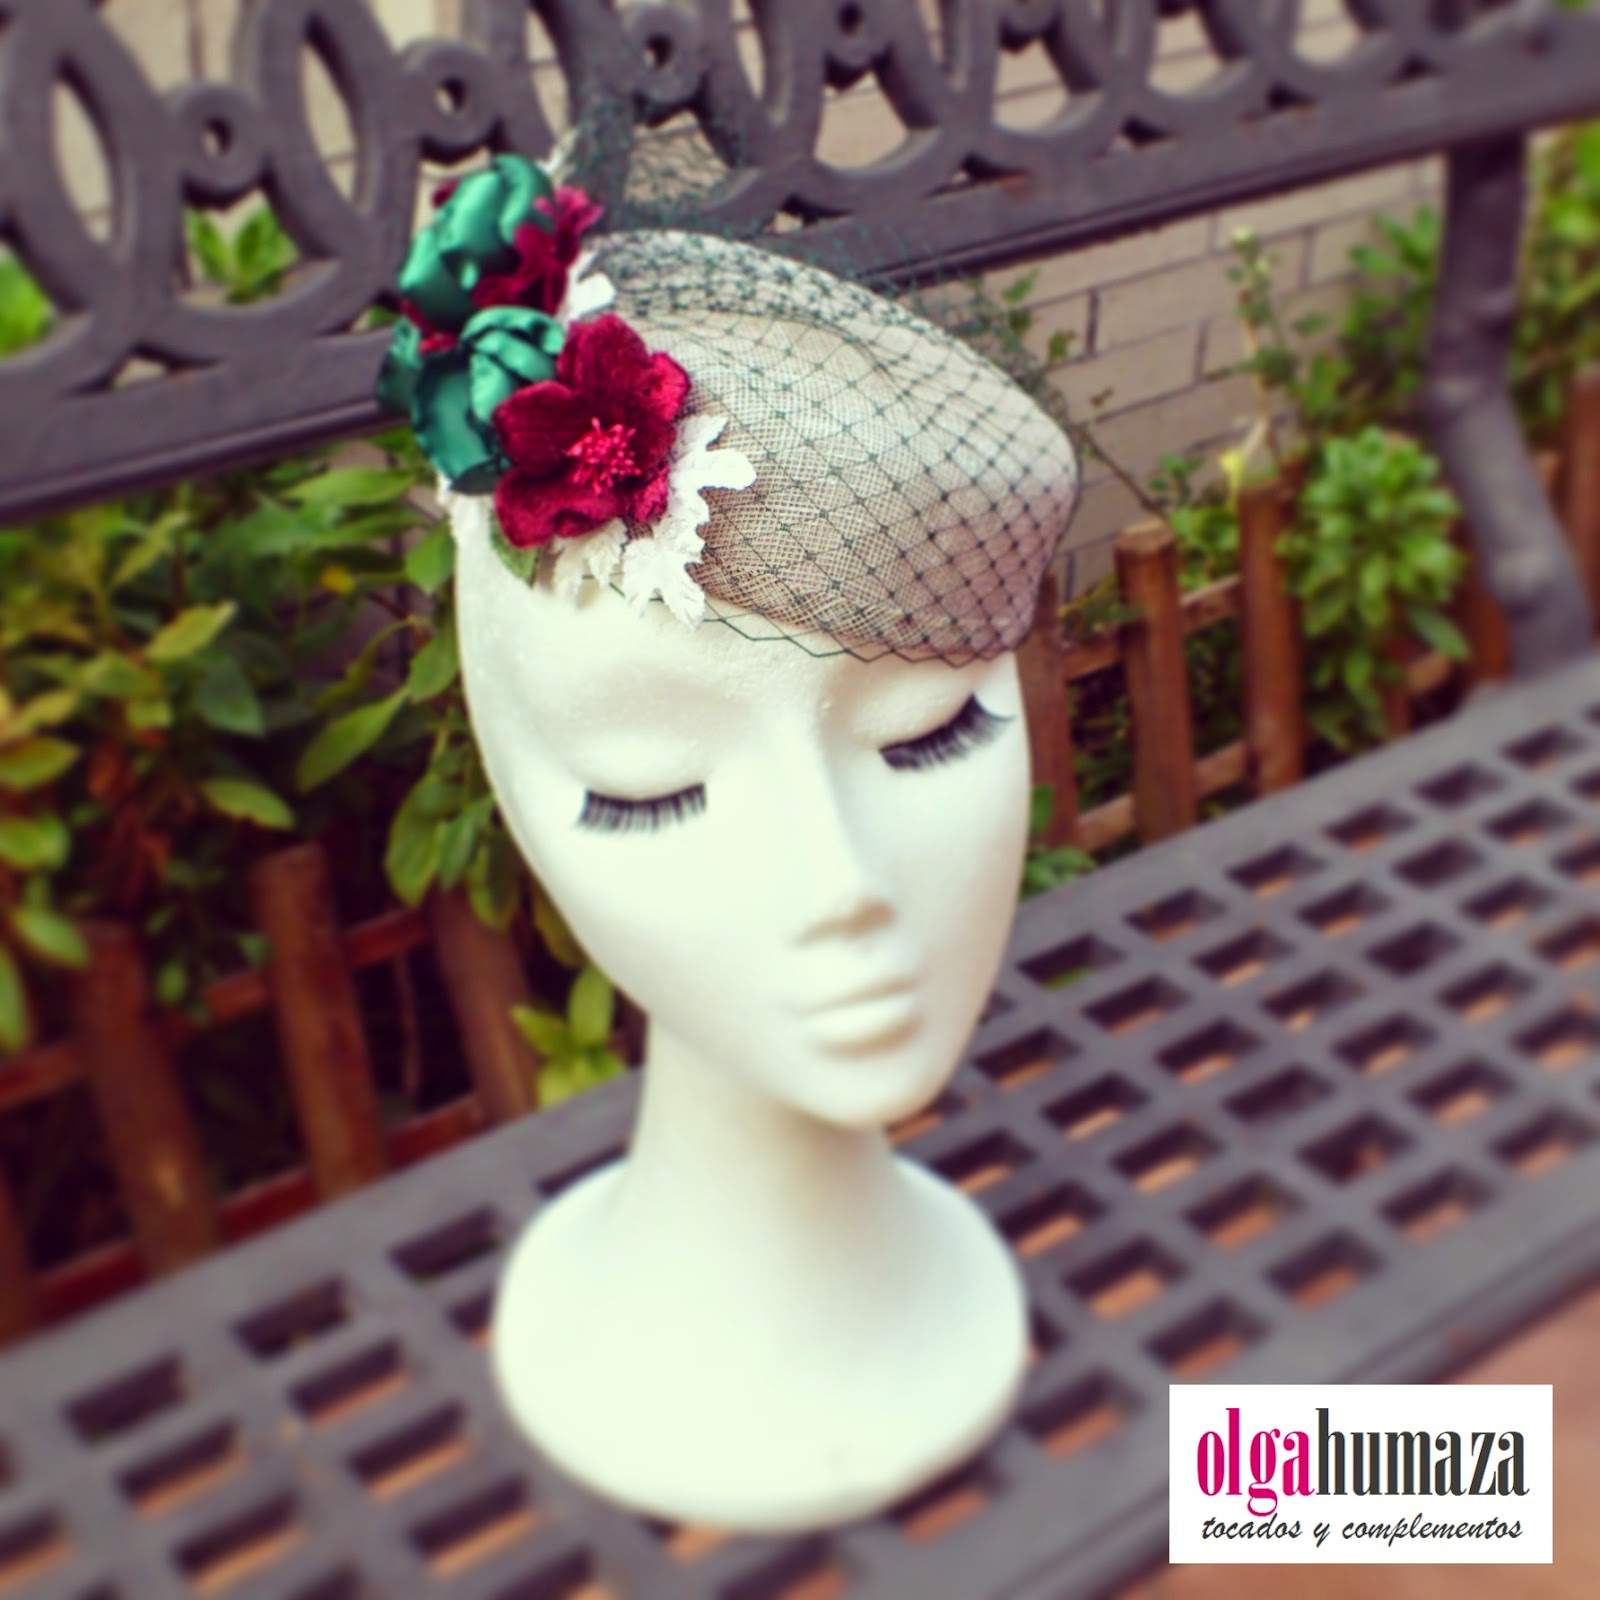 http://olgahumaza.blogspot.com.es/2015/02/b50-tocado-casquete-plata-y-adornos-en.html